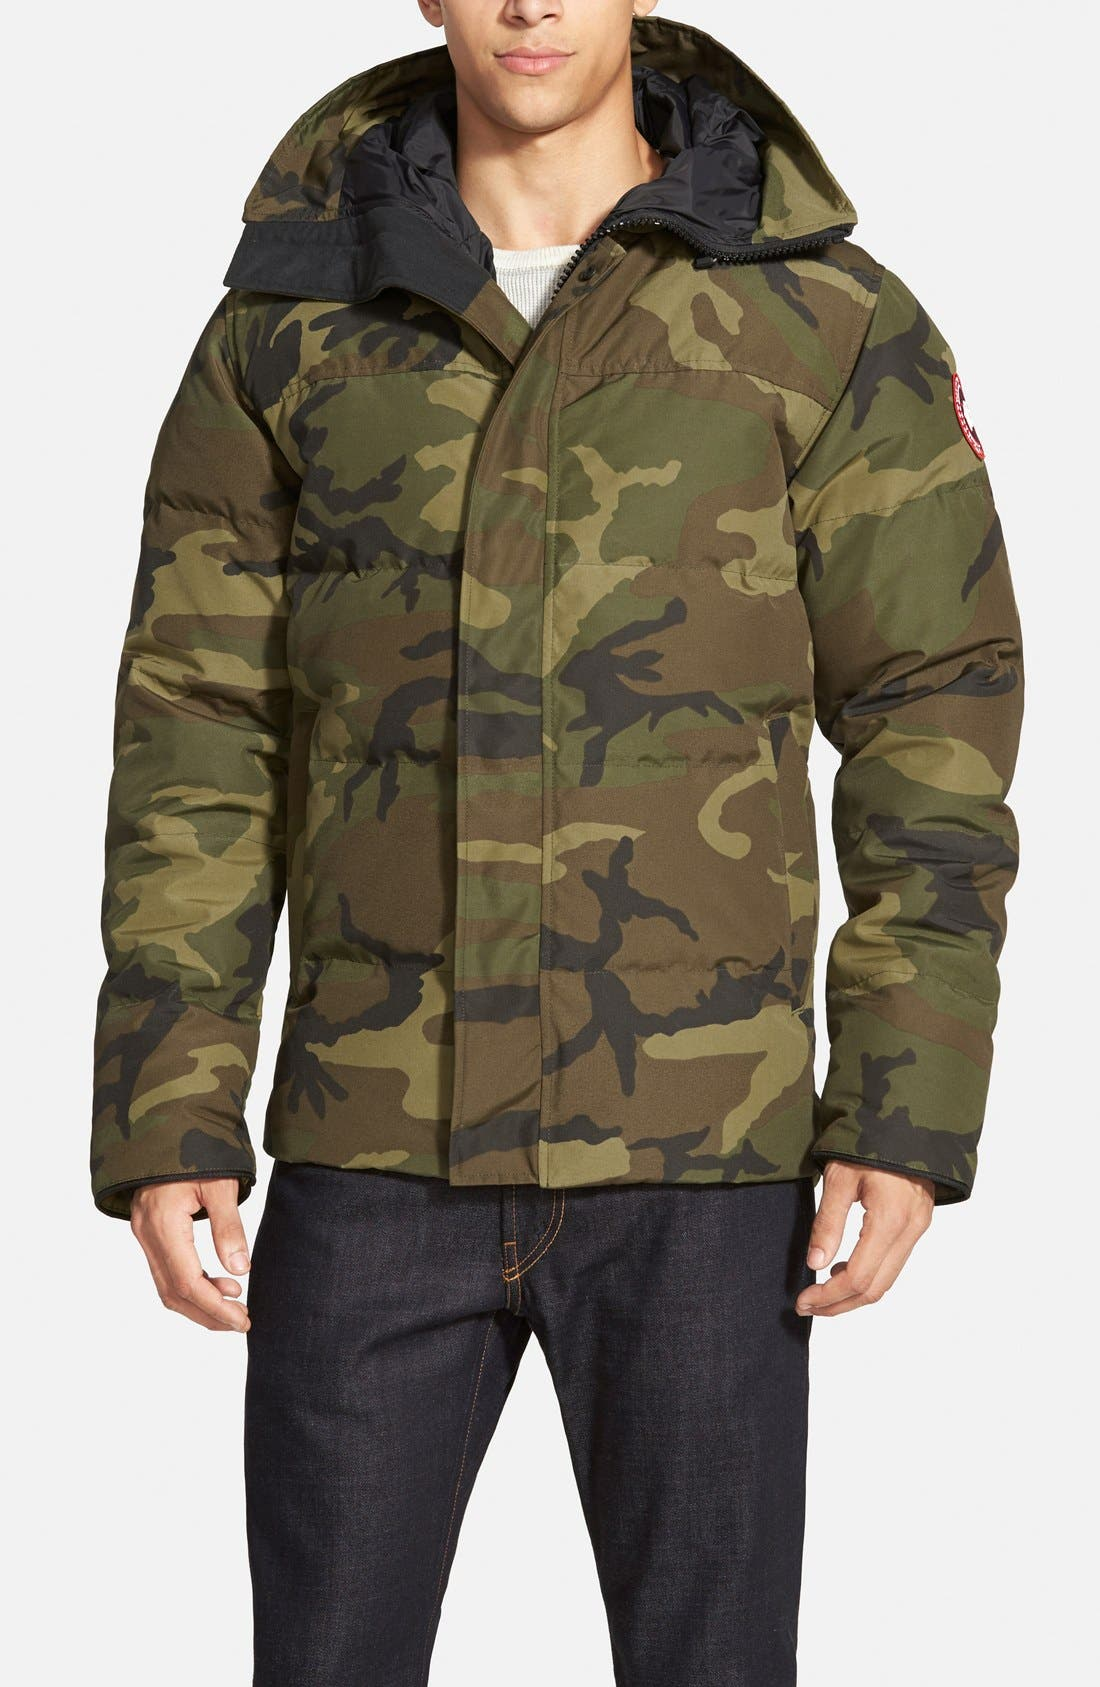 CANADA GOOSE 'MacMillan' Slim Fit Hooded Parka, Main, color, CLASSIC CAMO